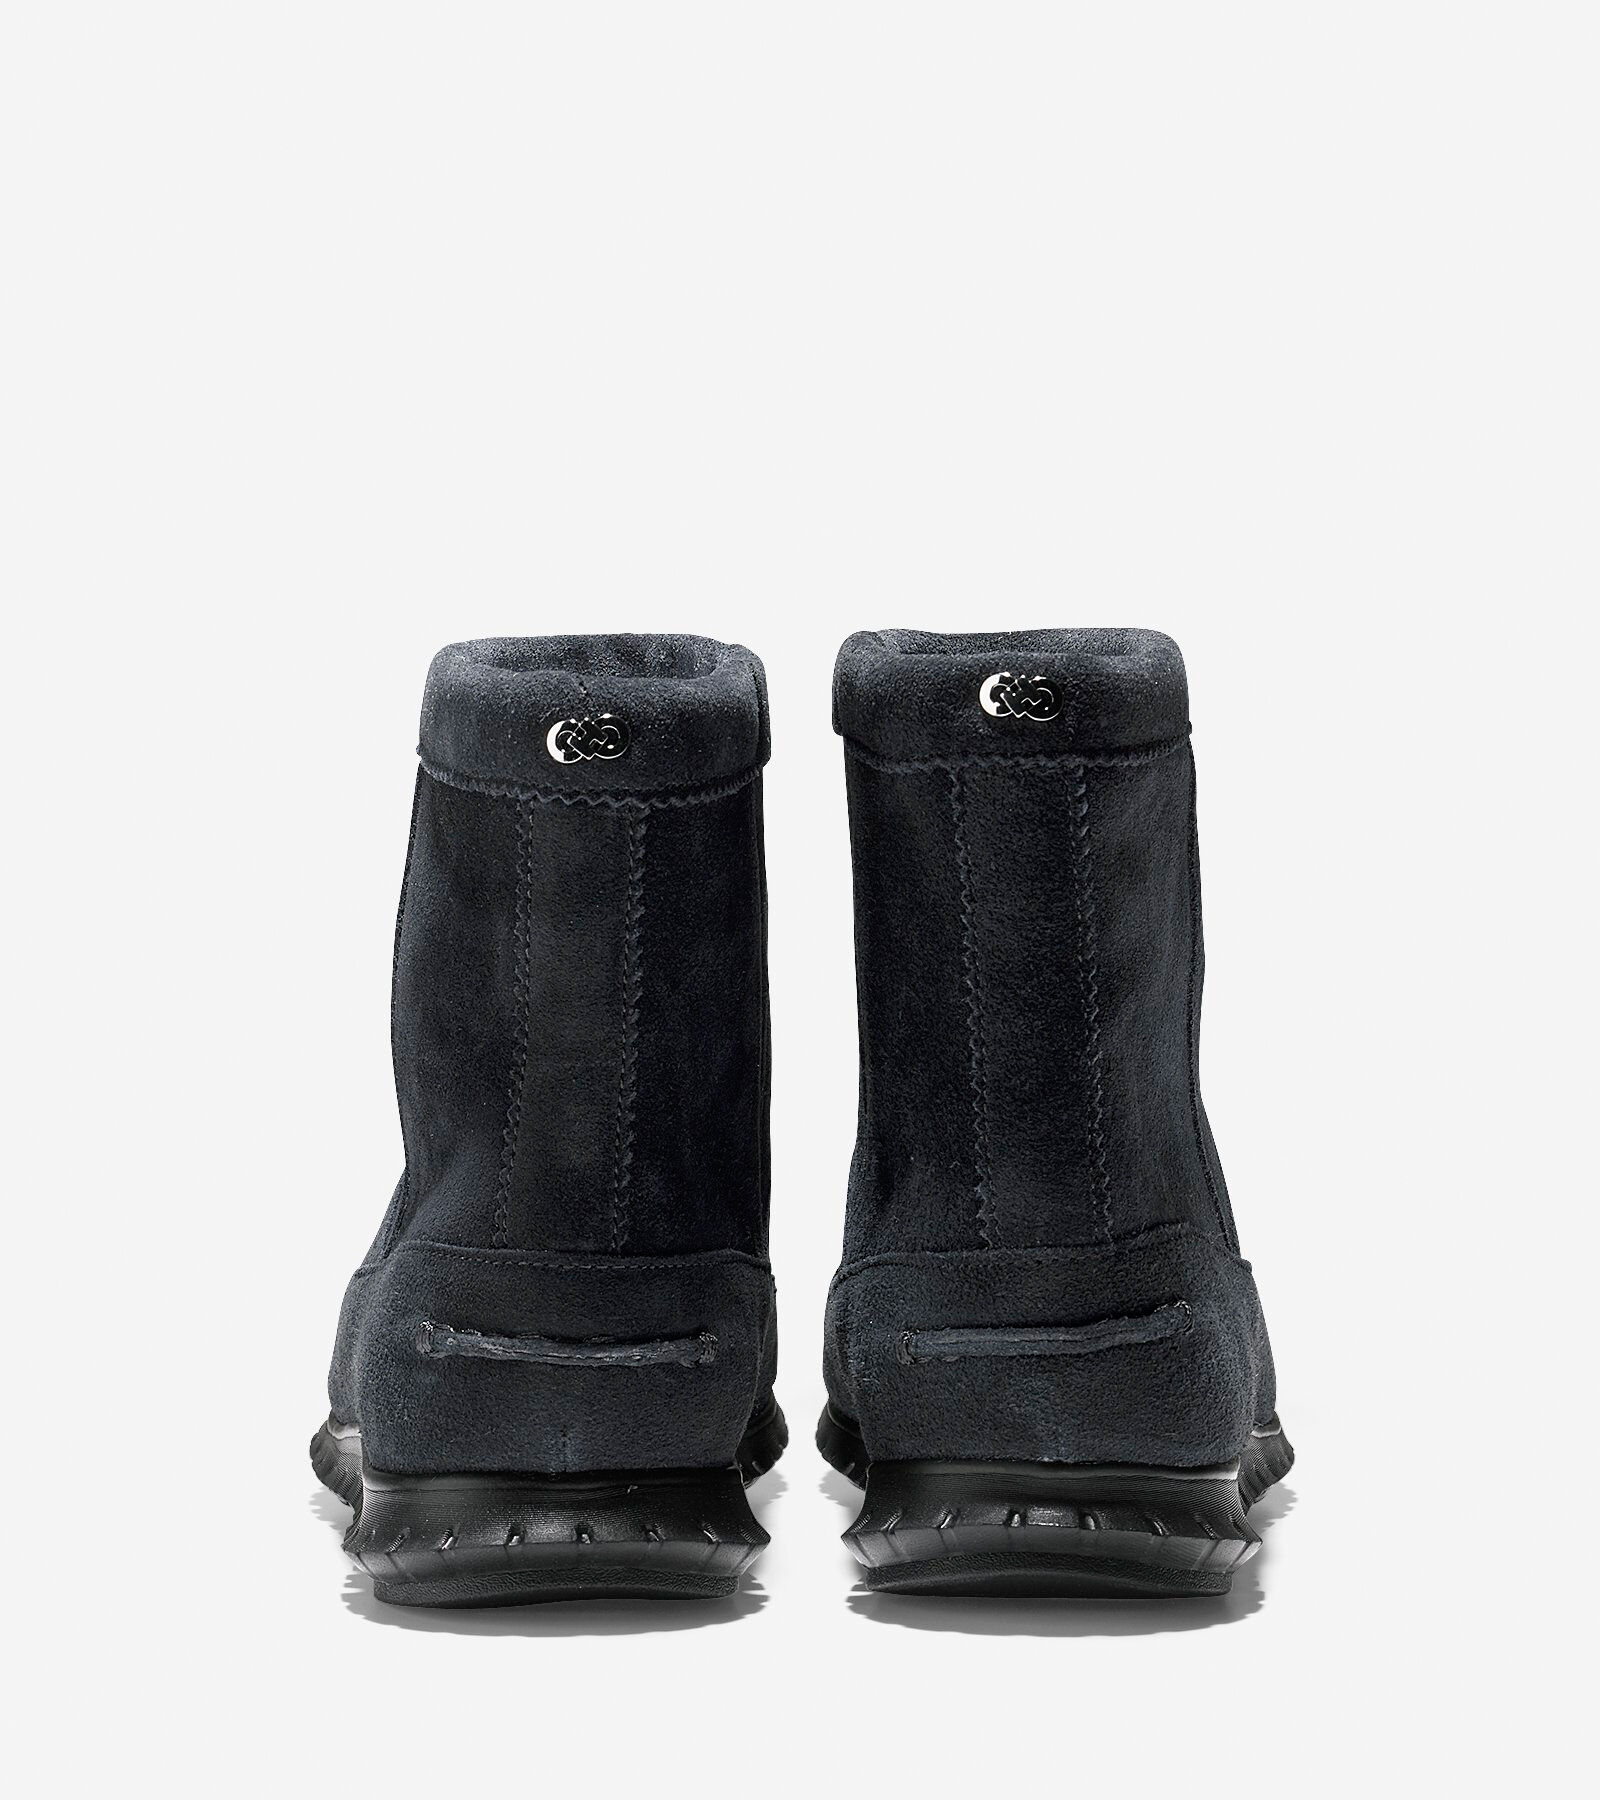 db302b825a2 Haan In Zerogrand Black Cole Waterproof Booties X6n6xwCqg4